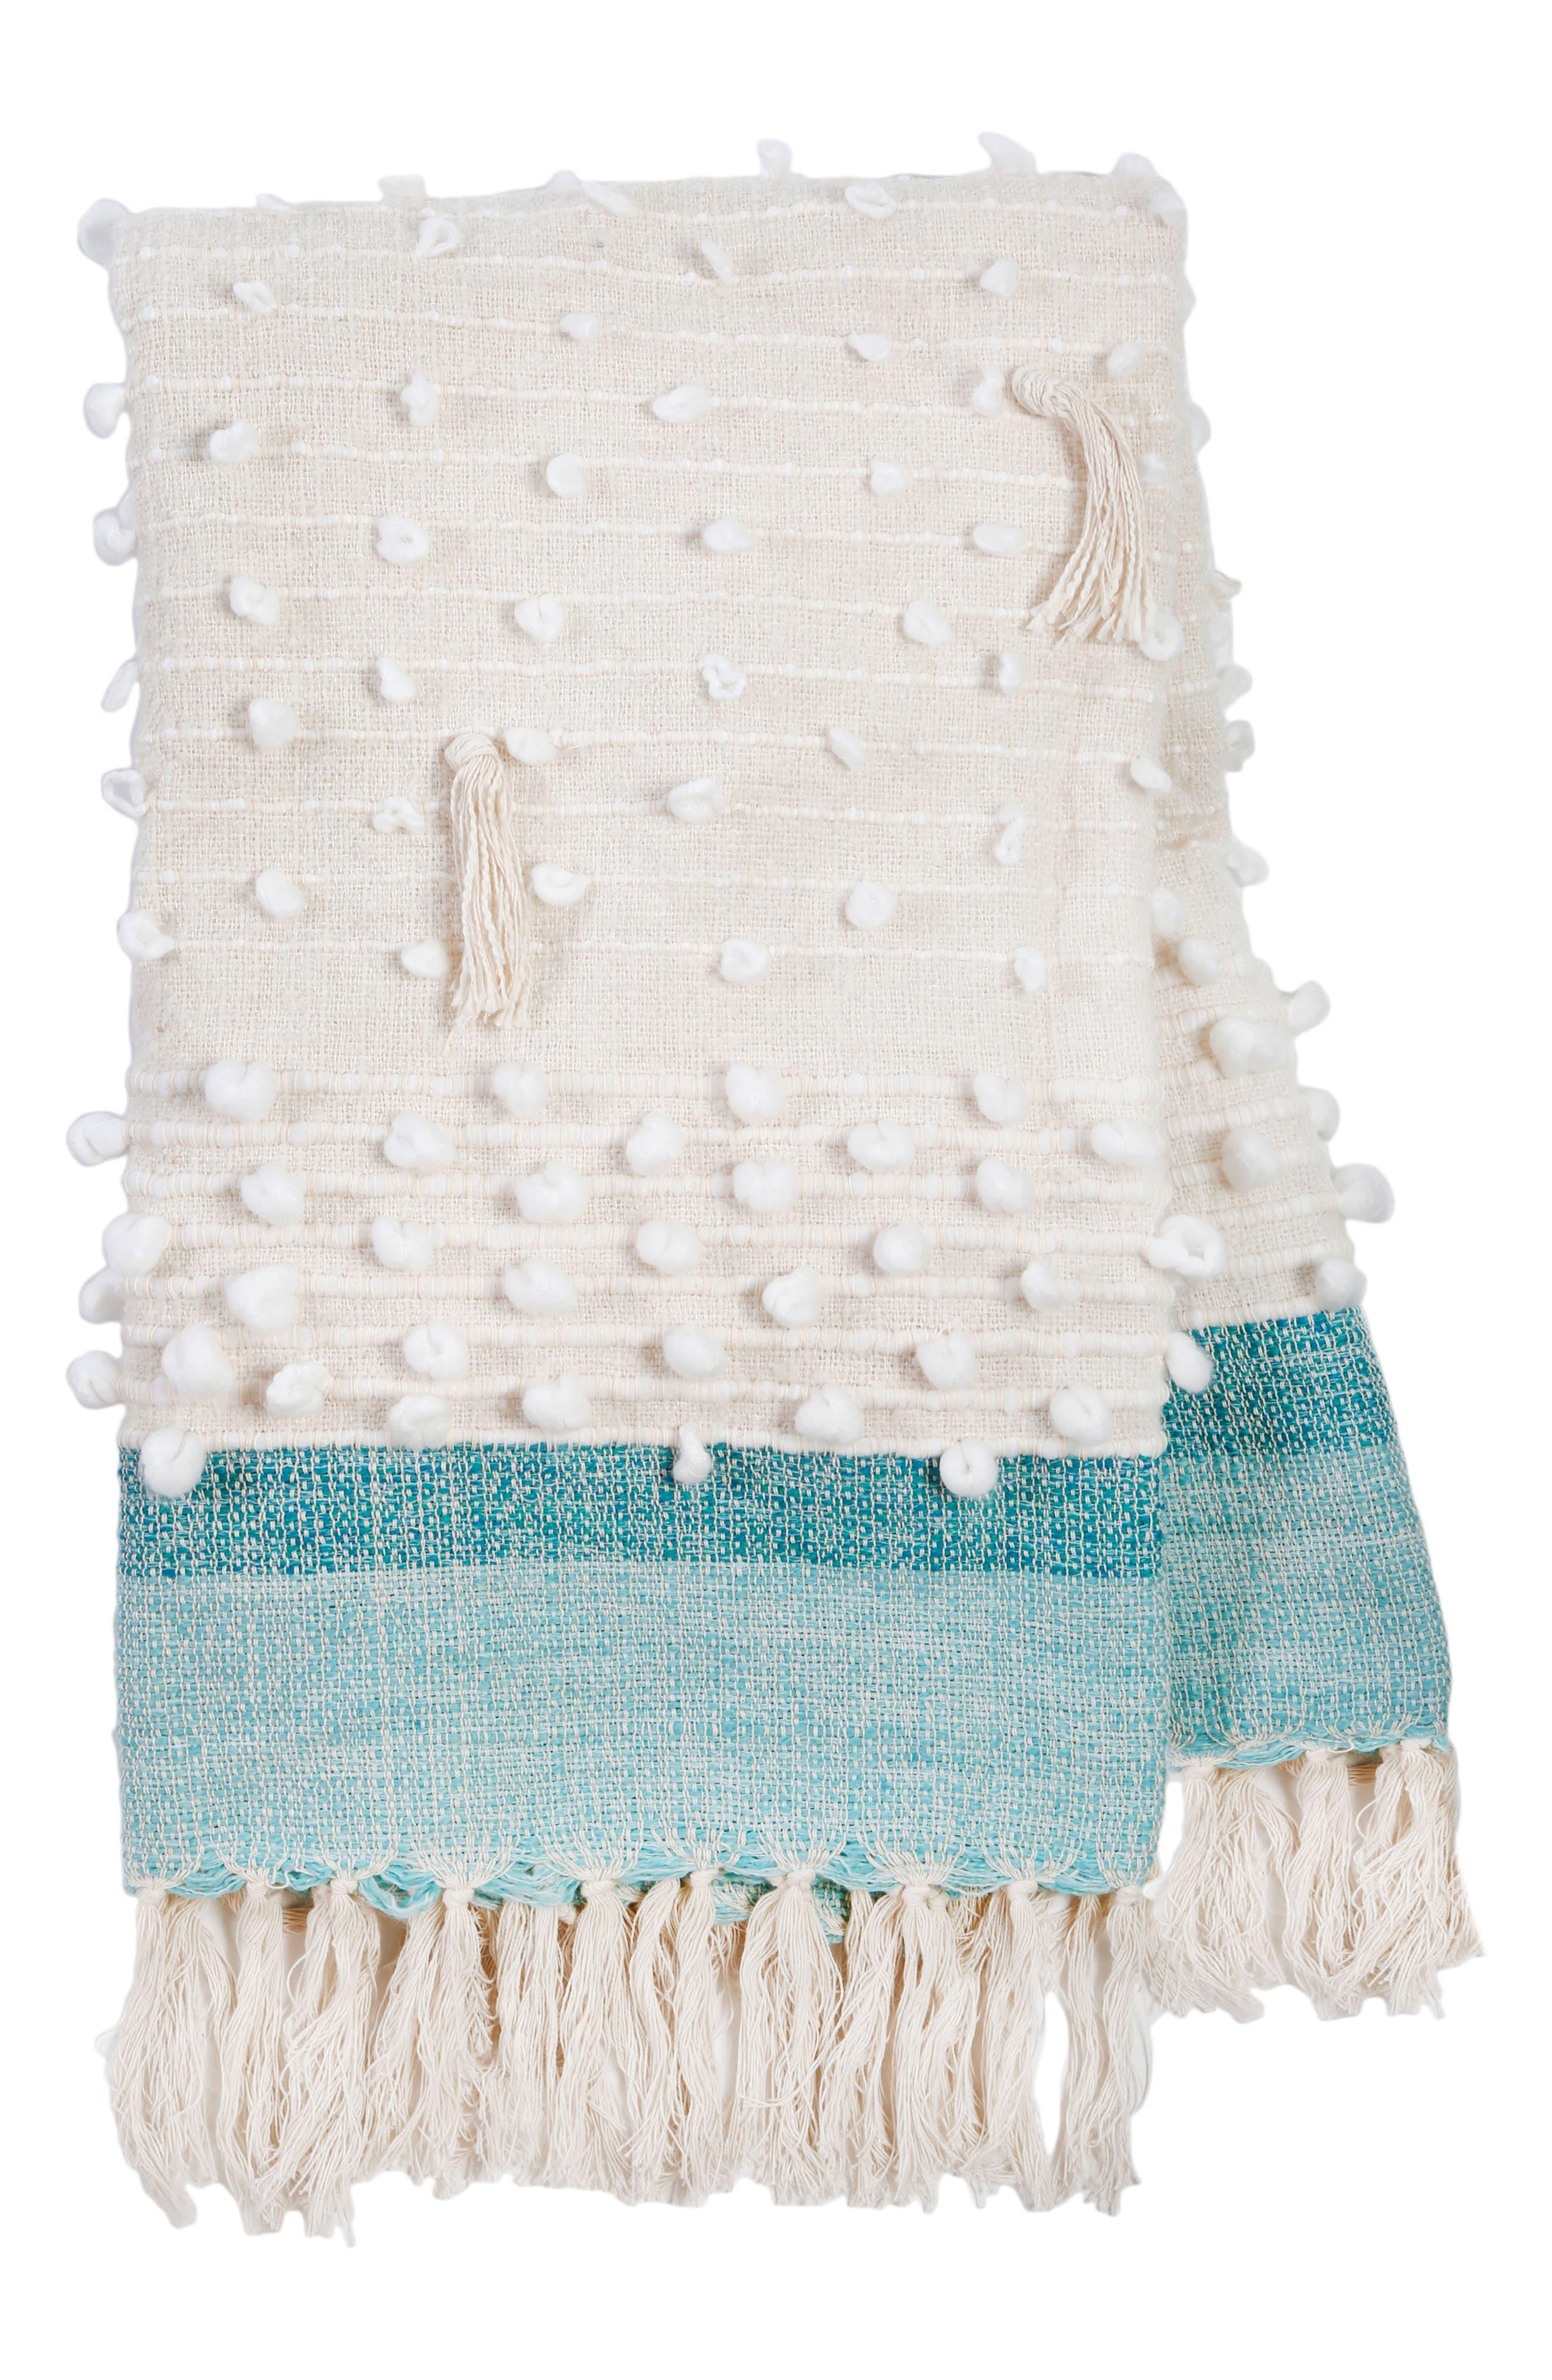 Ziggy Woven Throw Blanket,                         Main,                         color, IVORY/ AQUA